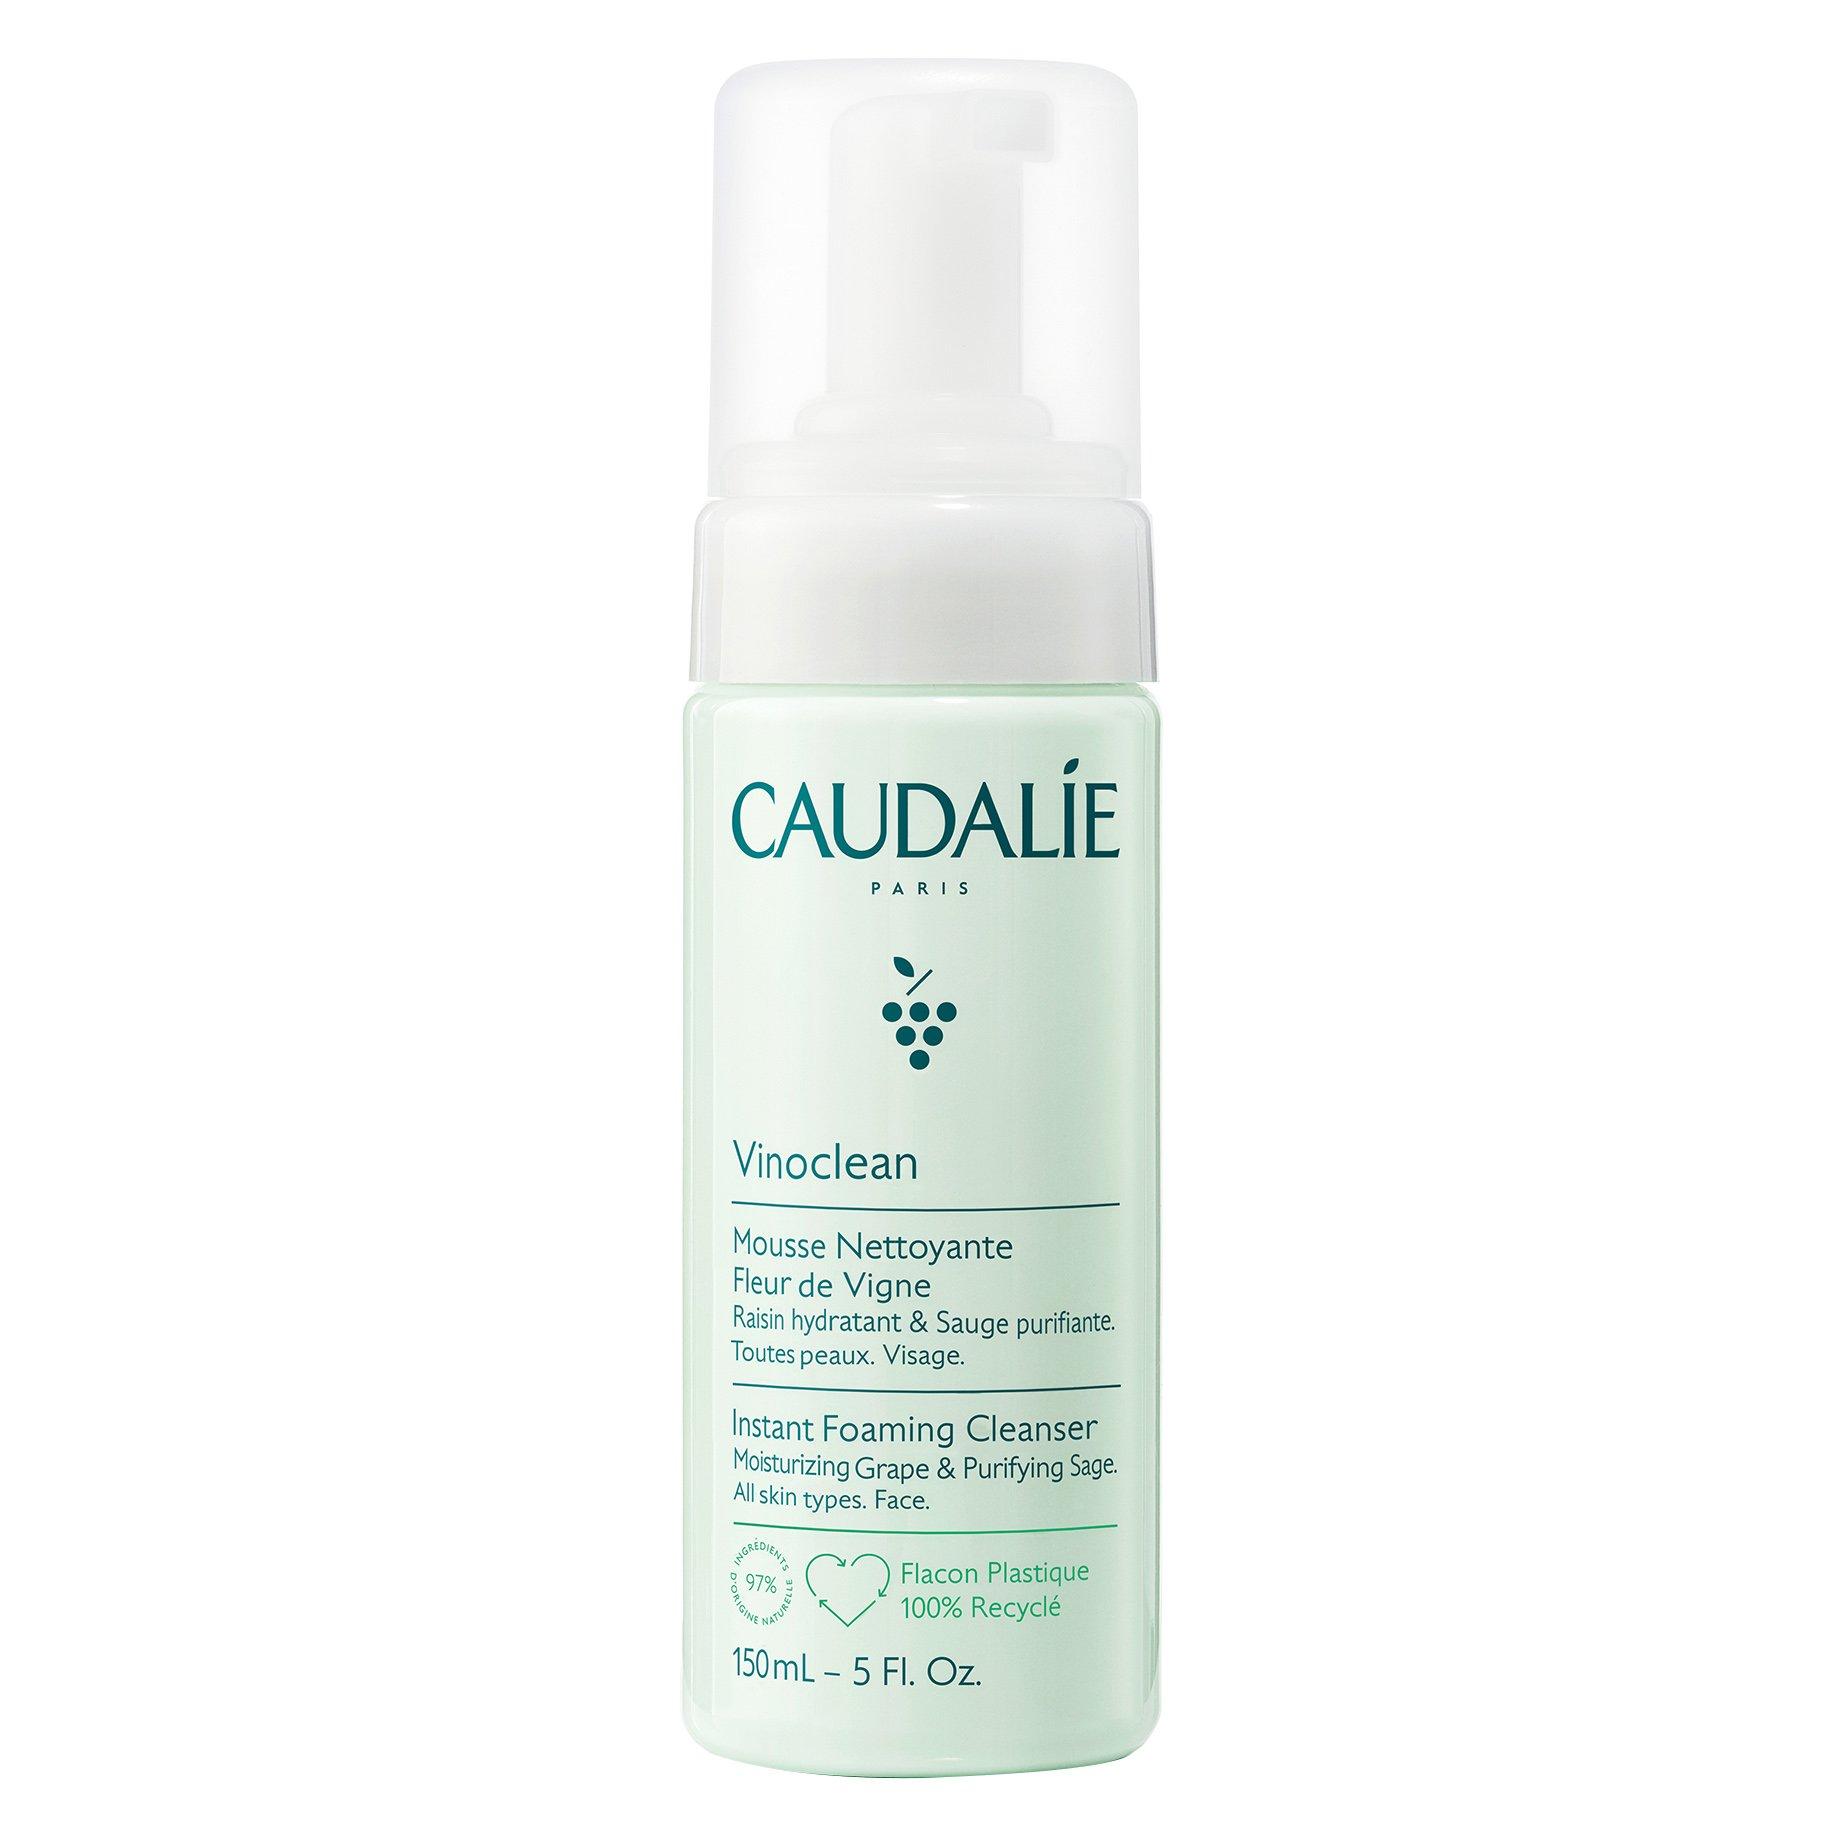 Caudalie Vinoclean Instant Foaming Cleanser Εξυγιαντικός Αφρός Καθαρισμού Προσώπου, Όλοι οι Τύποι Επιδερμίδας 150ml